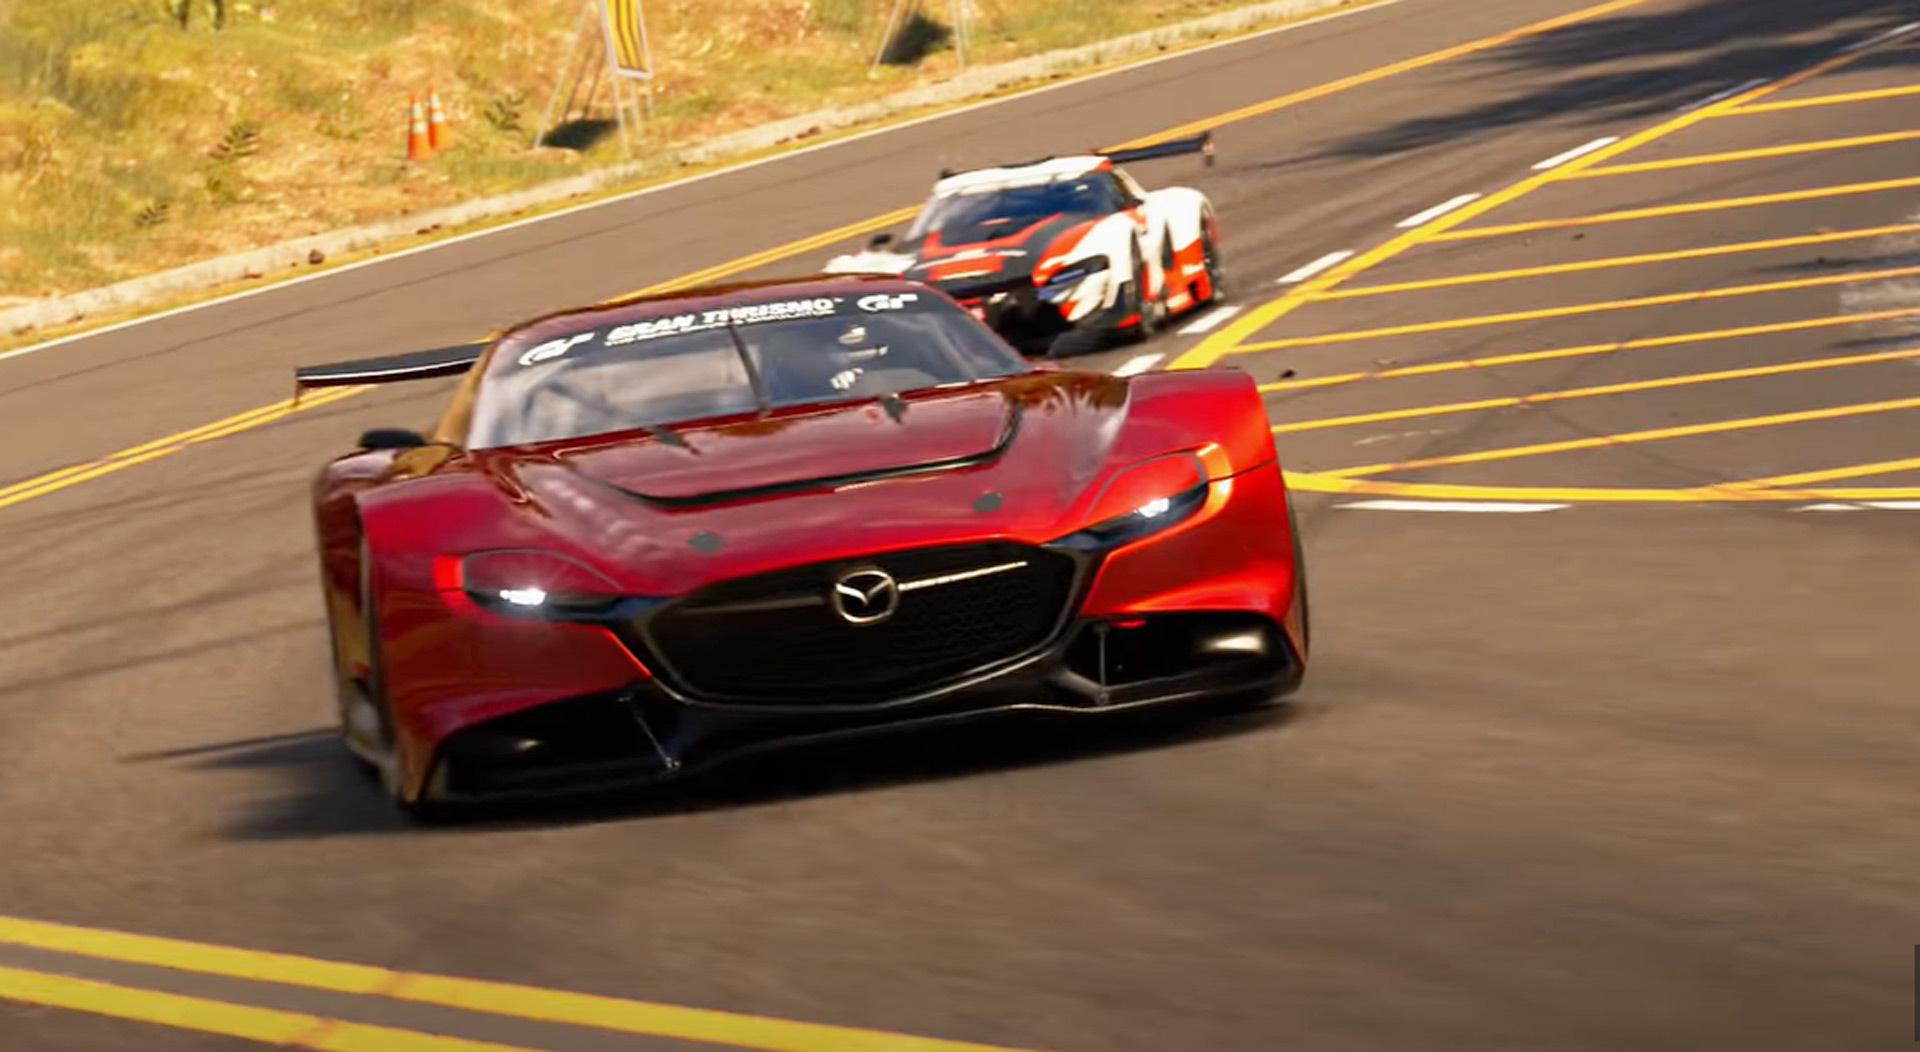 Энтузиаст сравнил графику игр Gran Turismo на PlayStation 5 и PlayStation 4 Pro